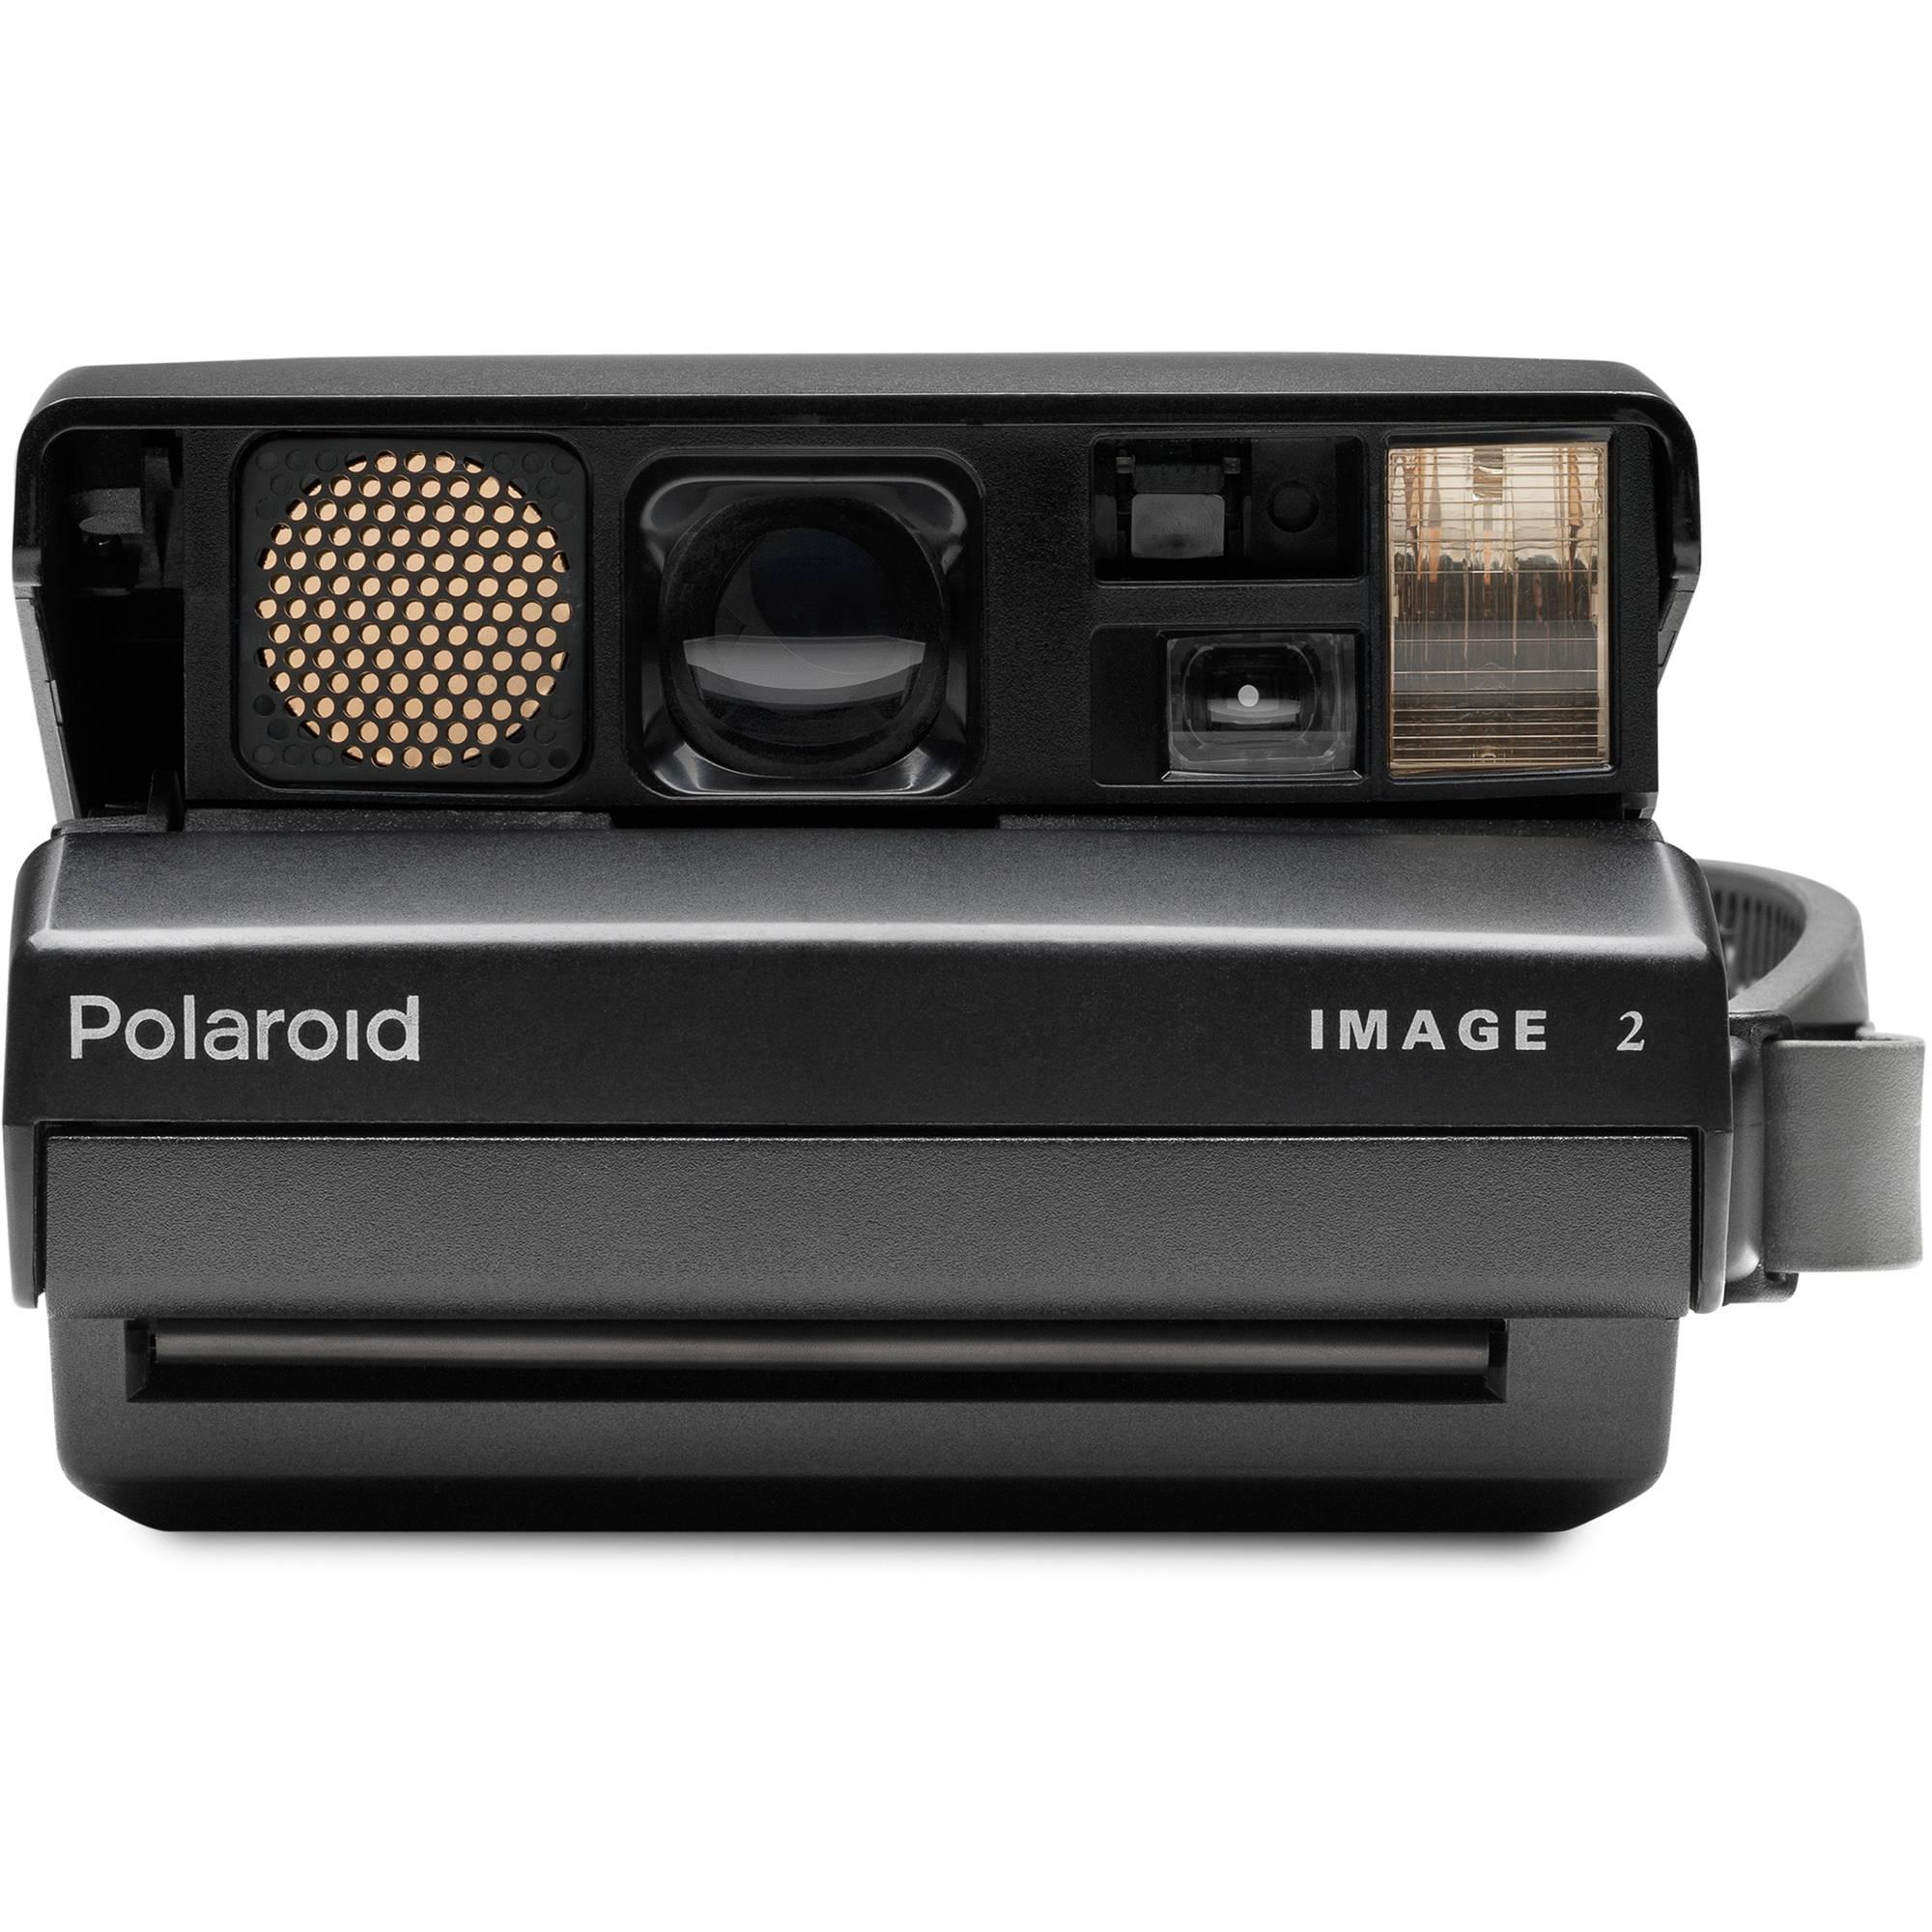 impossible polaroid spectra first edition instant film camera rh bhphotovideo com Polaroid Spectra Pro Polaroid Spectra 2 Film